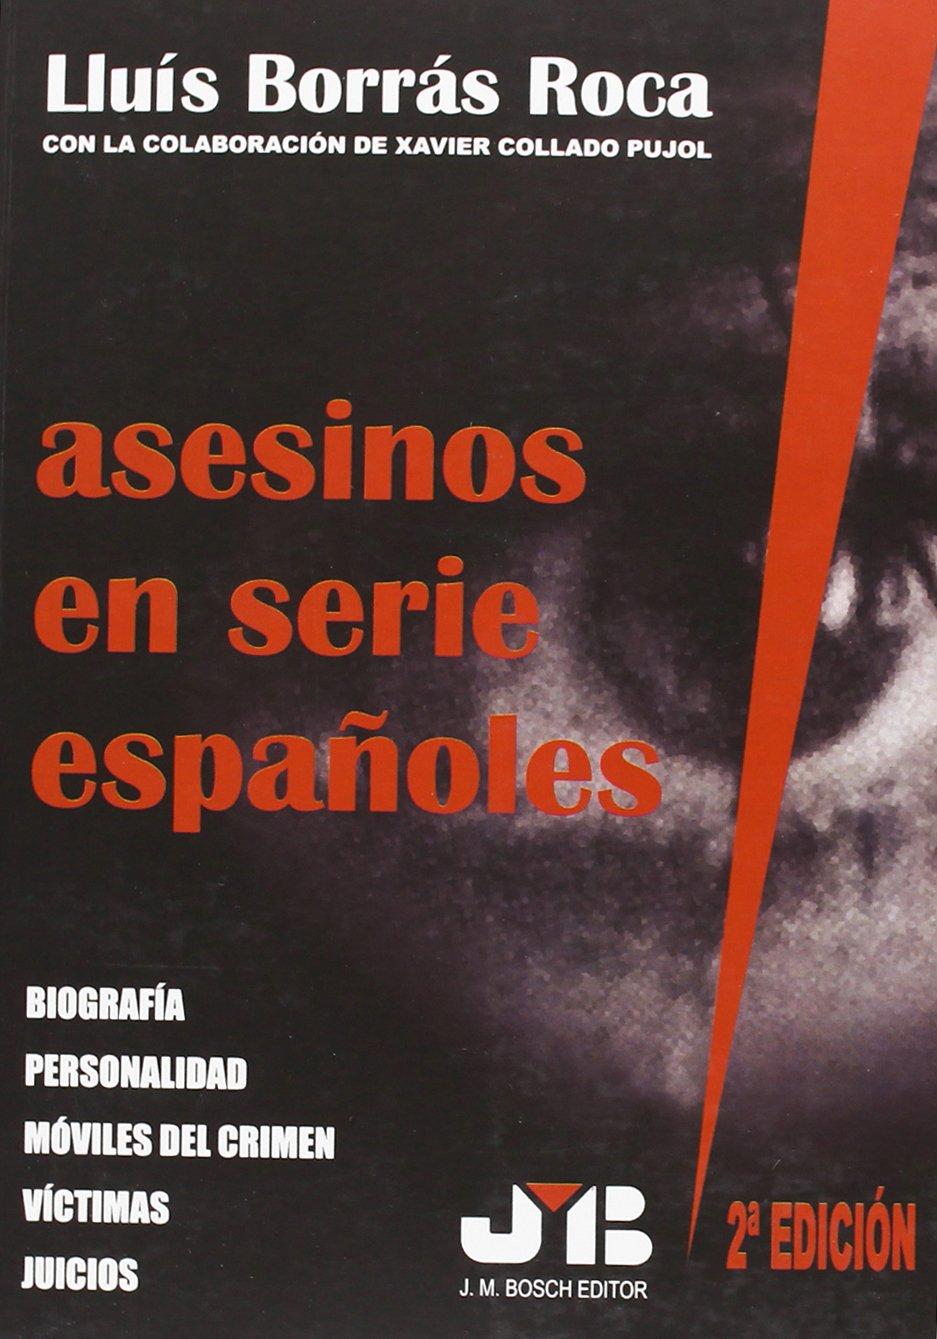 Asesinos En Serie Españoles Tapa blanda – 18 jun 2009 Lluís Borrás Roca J.M. Bosch Editor 8476986777 LAW / General